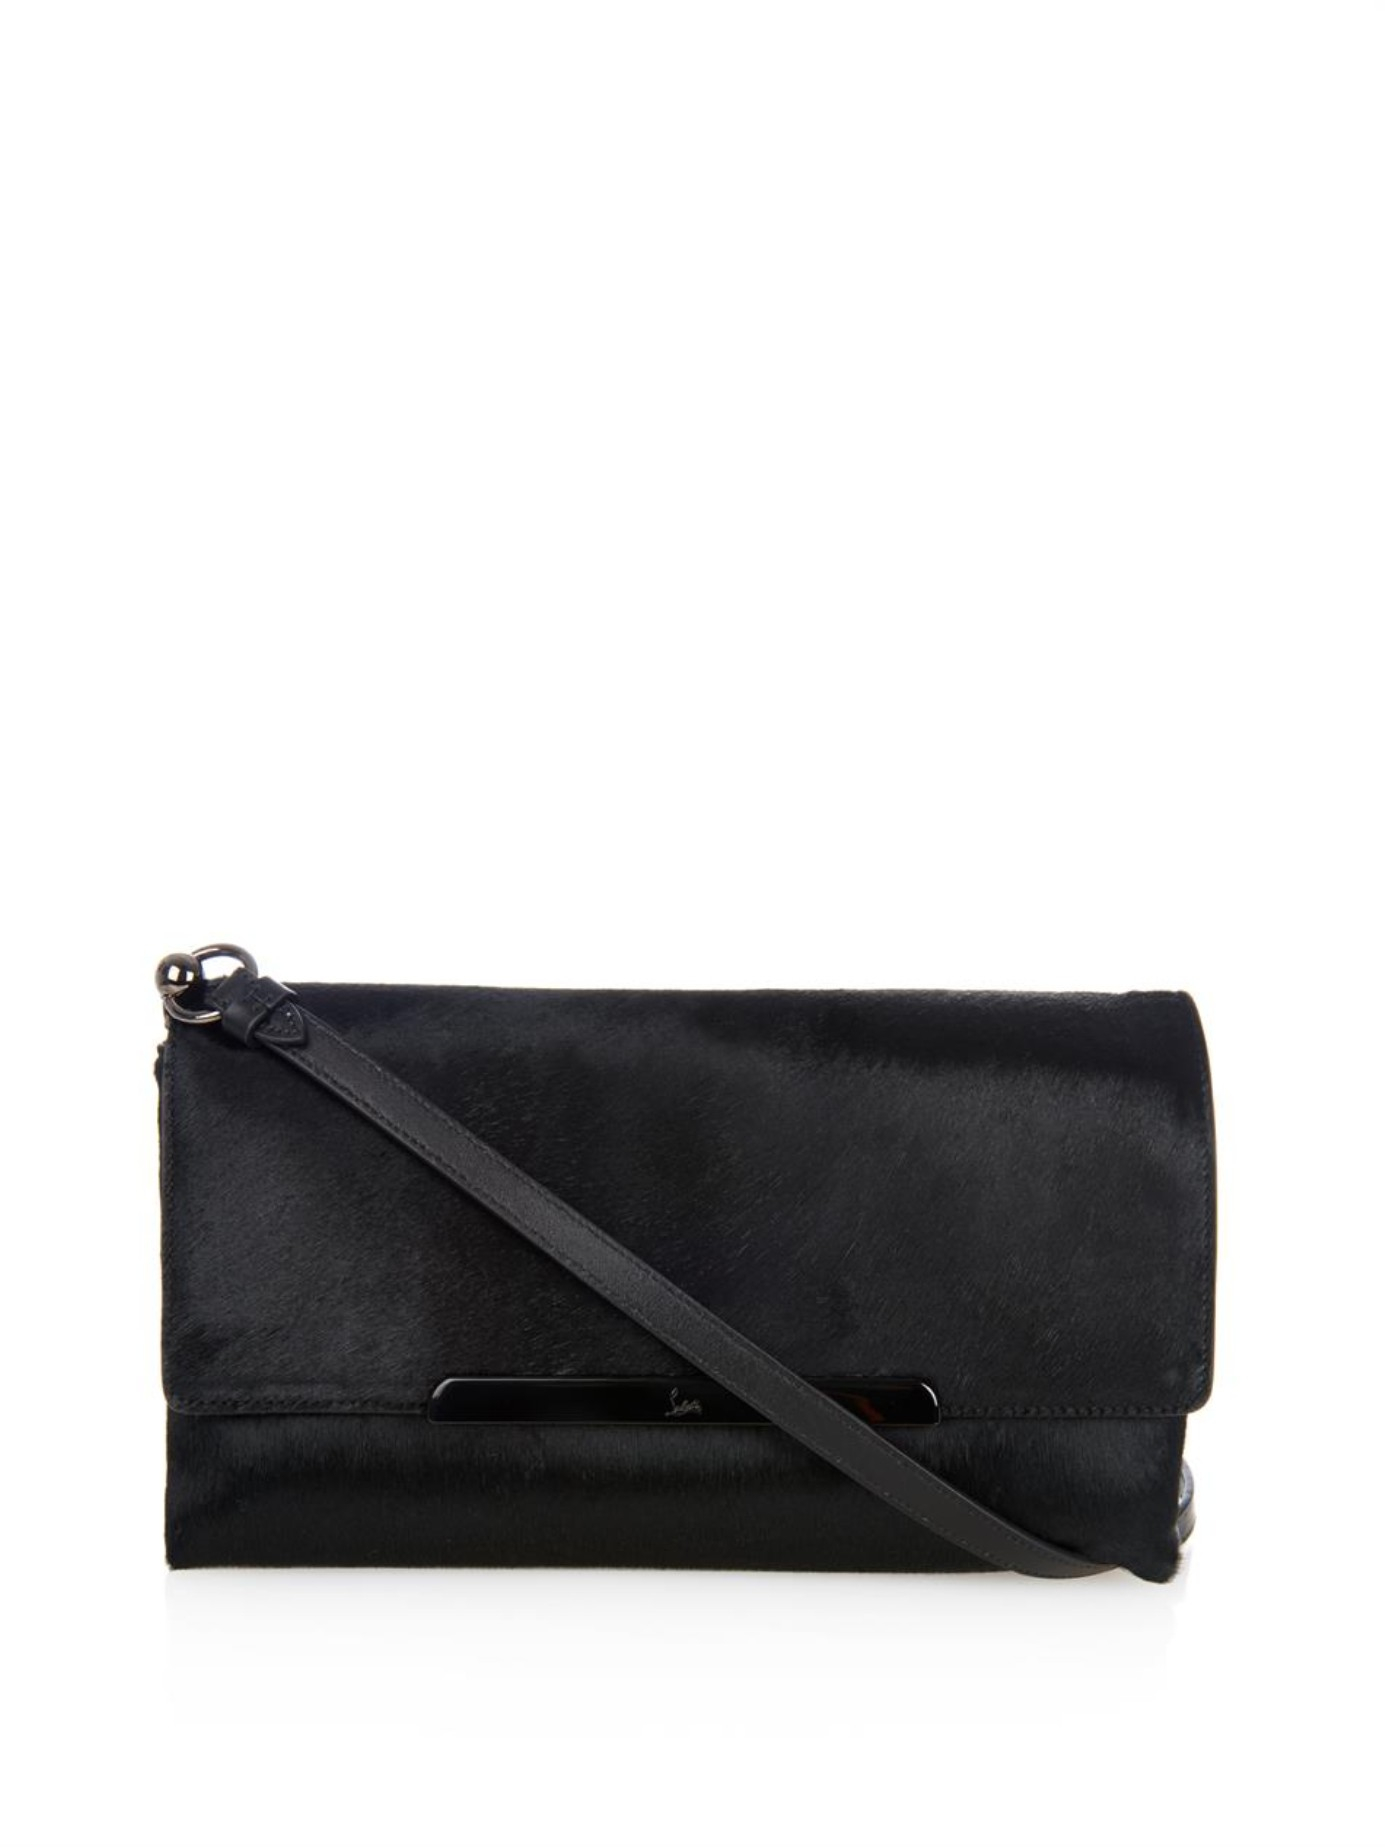 673557c96f2 Christian Louboutin Black Rougissime Calf-Hair Cross-Body Bag